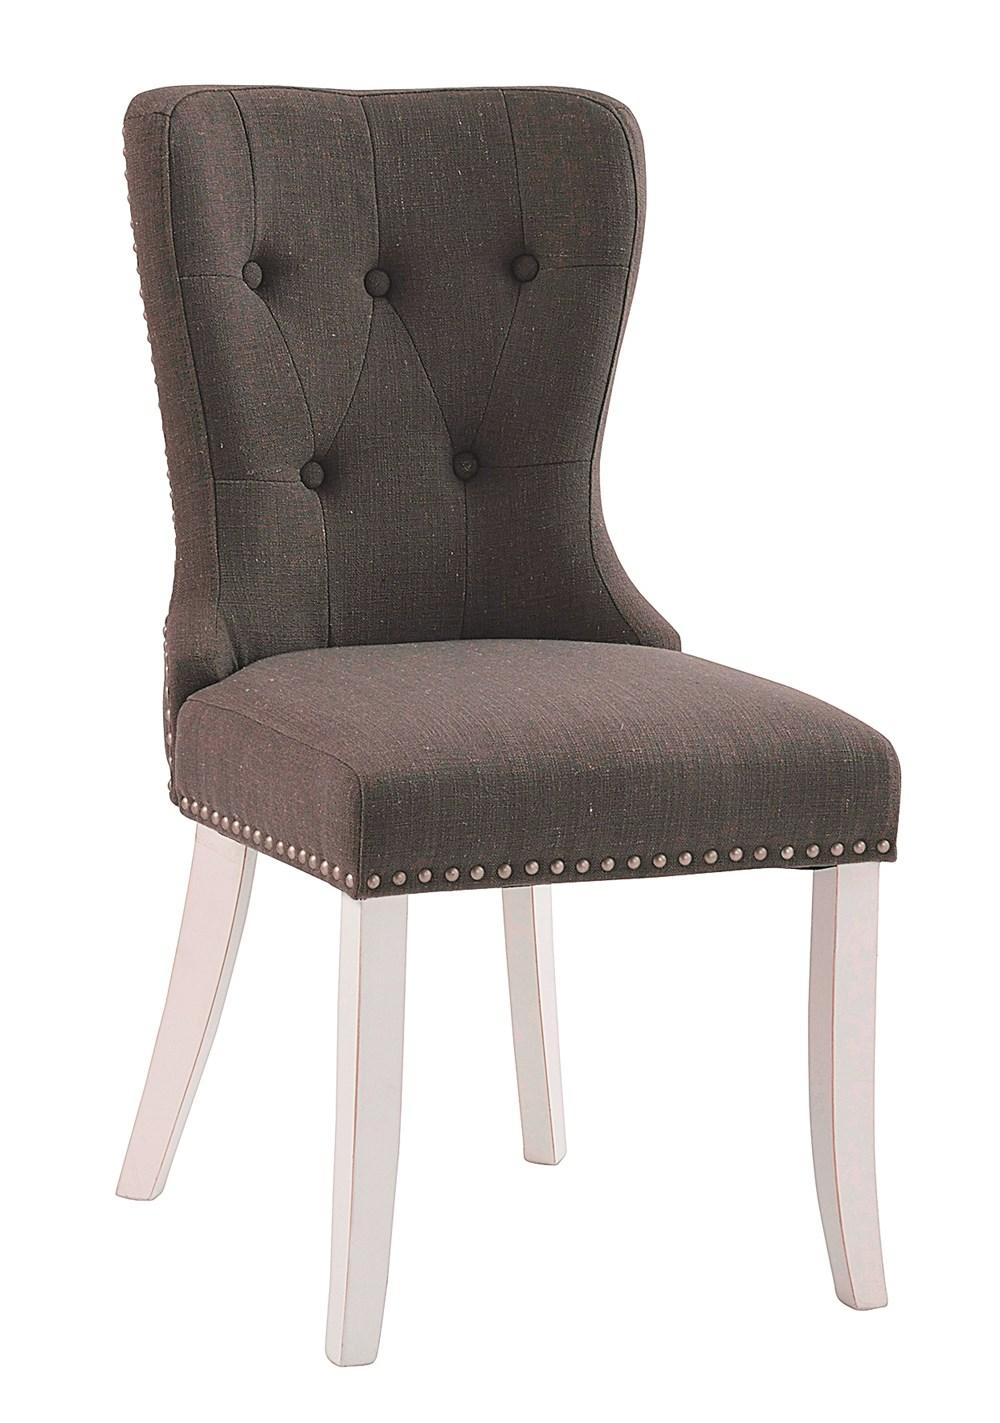 Adele tuoli harmaa kangas/valkoiset jalat, Rowico